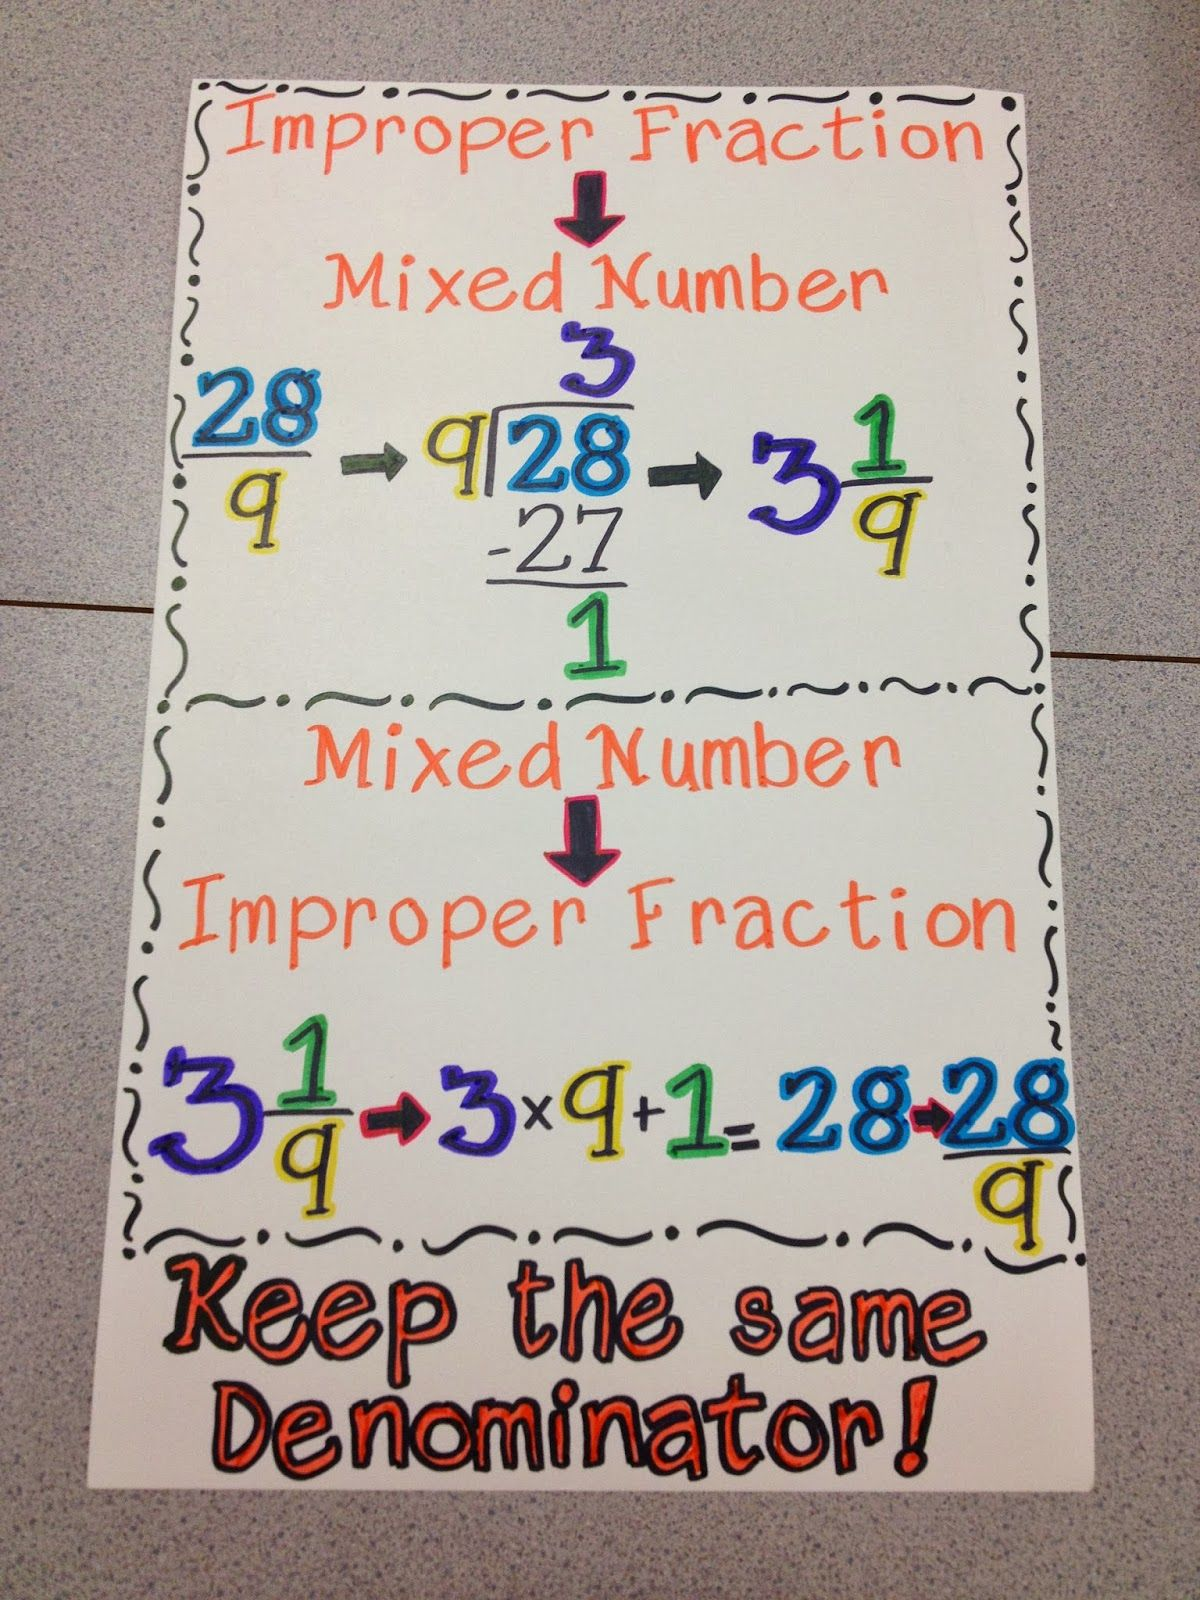 Retrieved R 10 30 14 Improper Fraction Amp Mixed Number